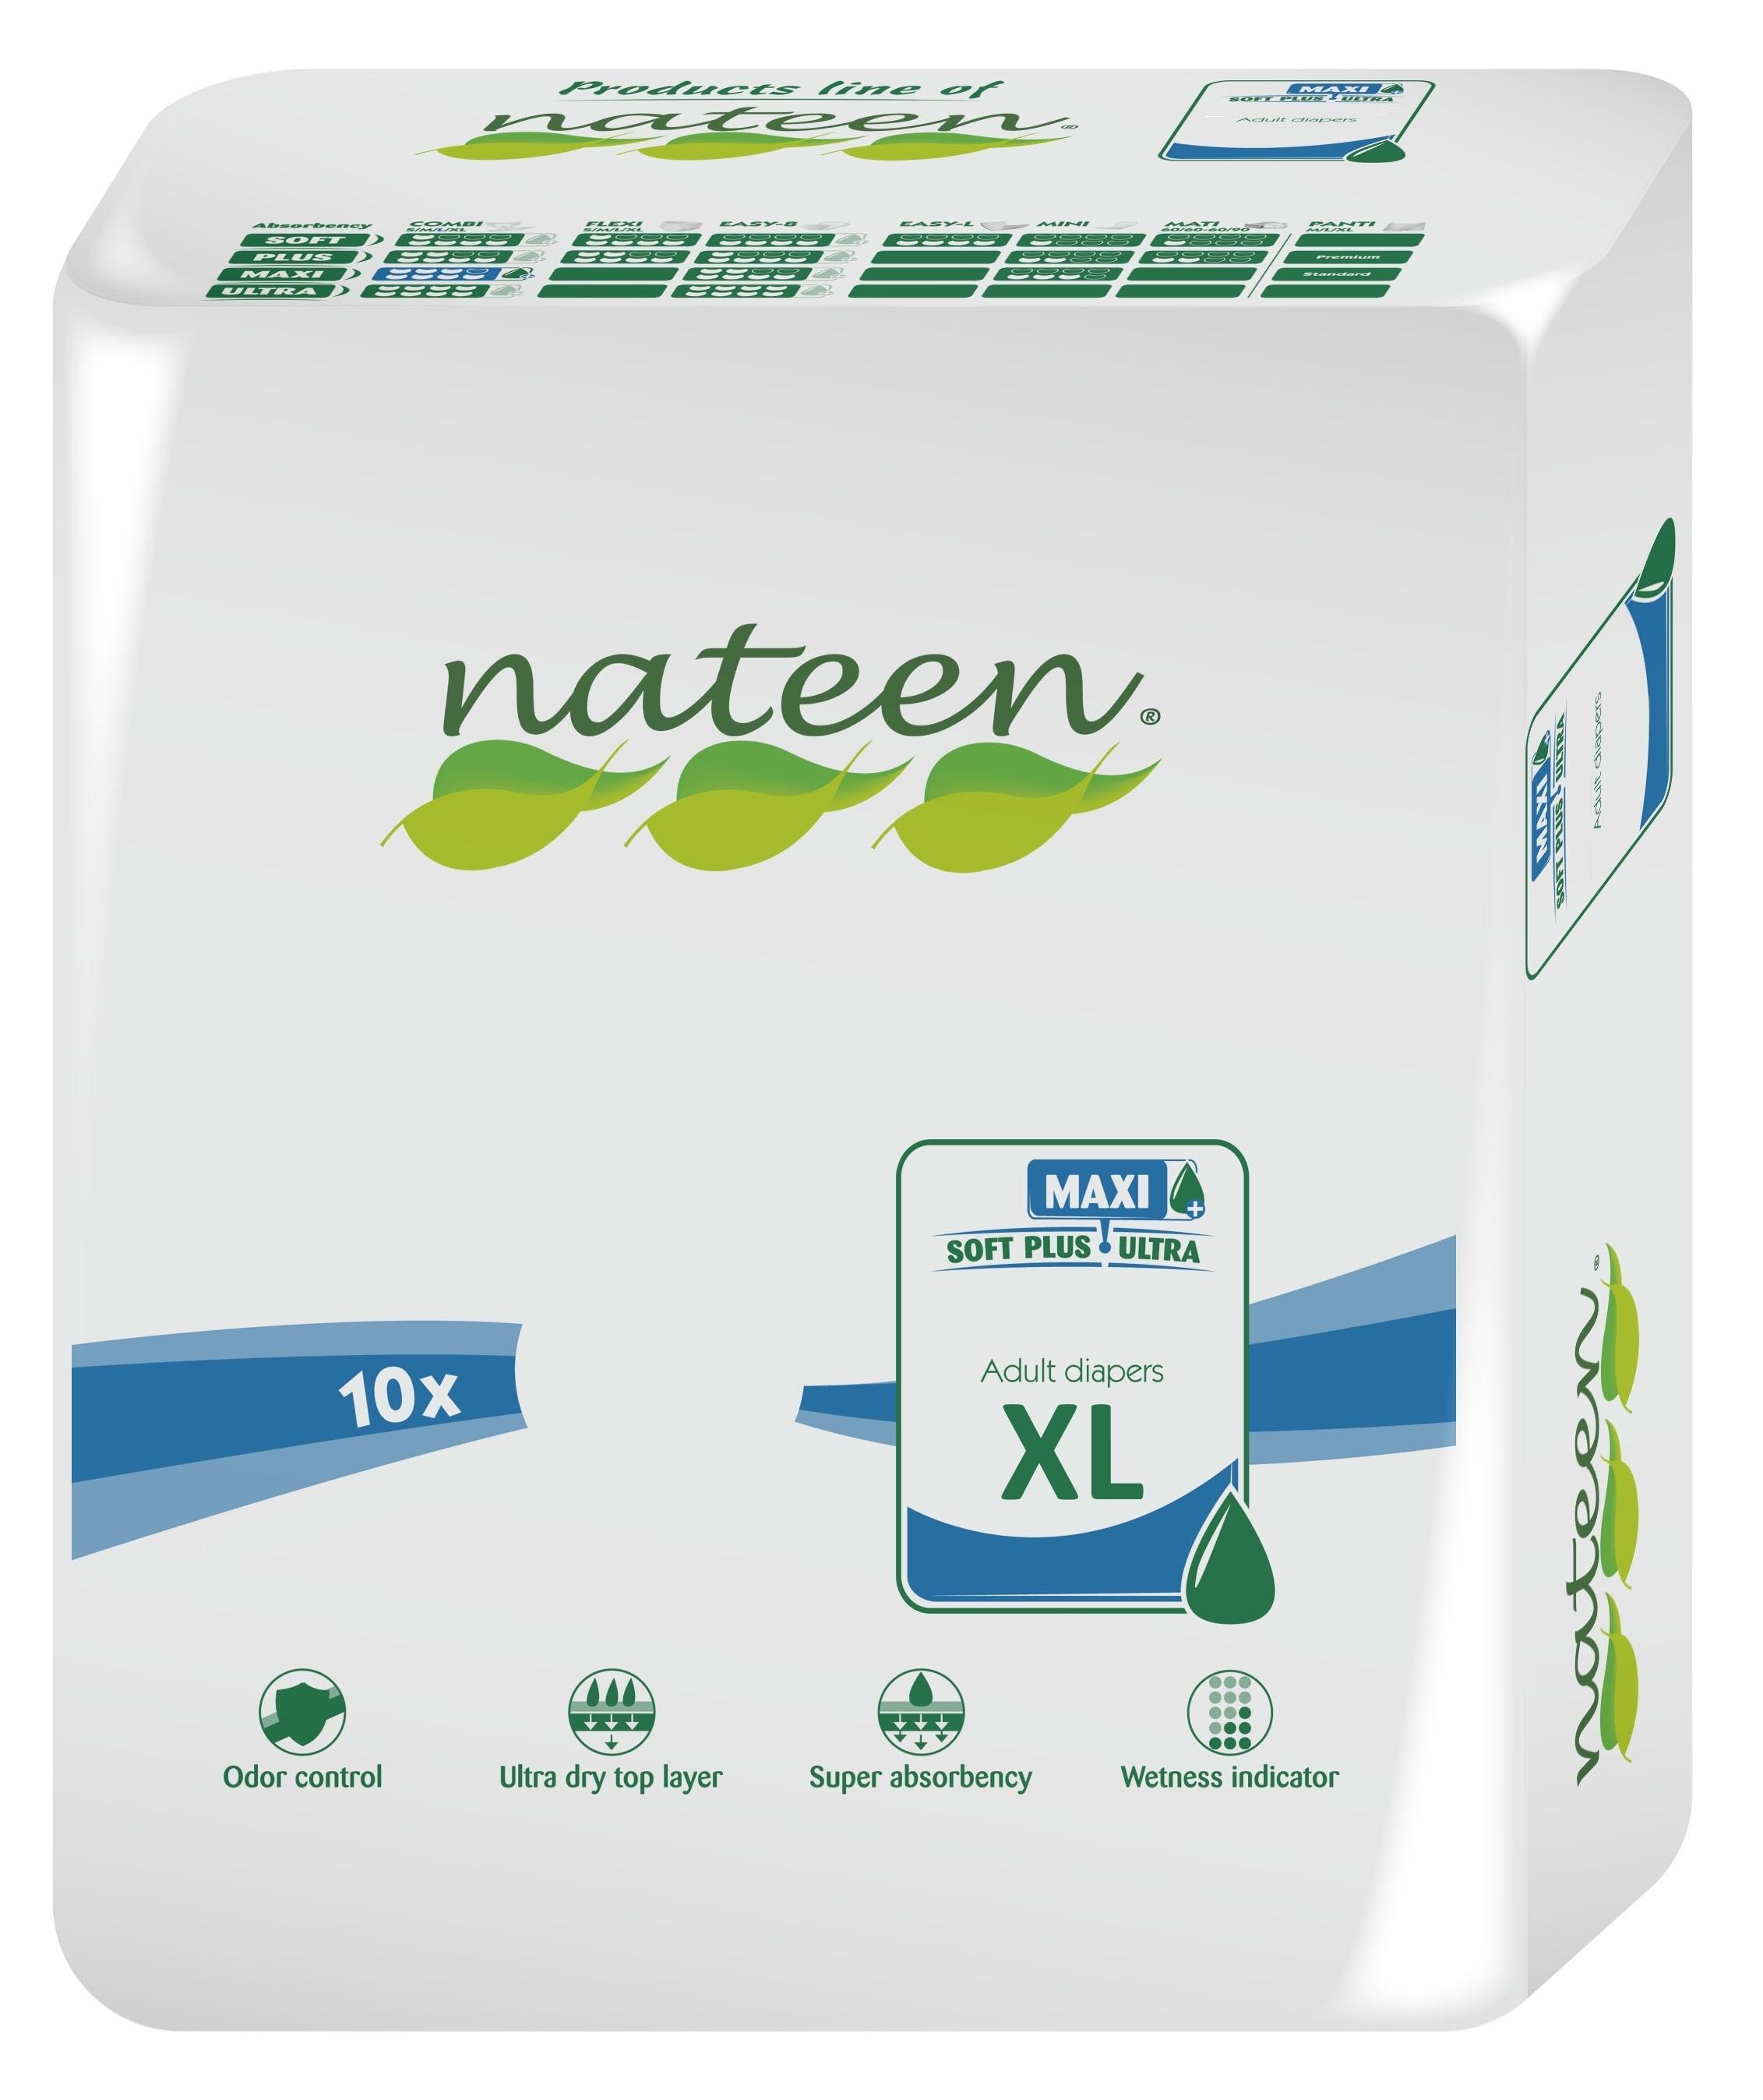 Nateen Flexi Maxi XL - 10 pull-up pants